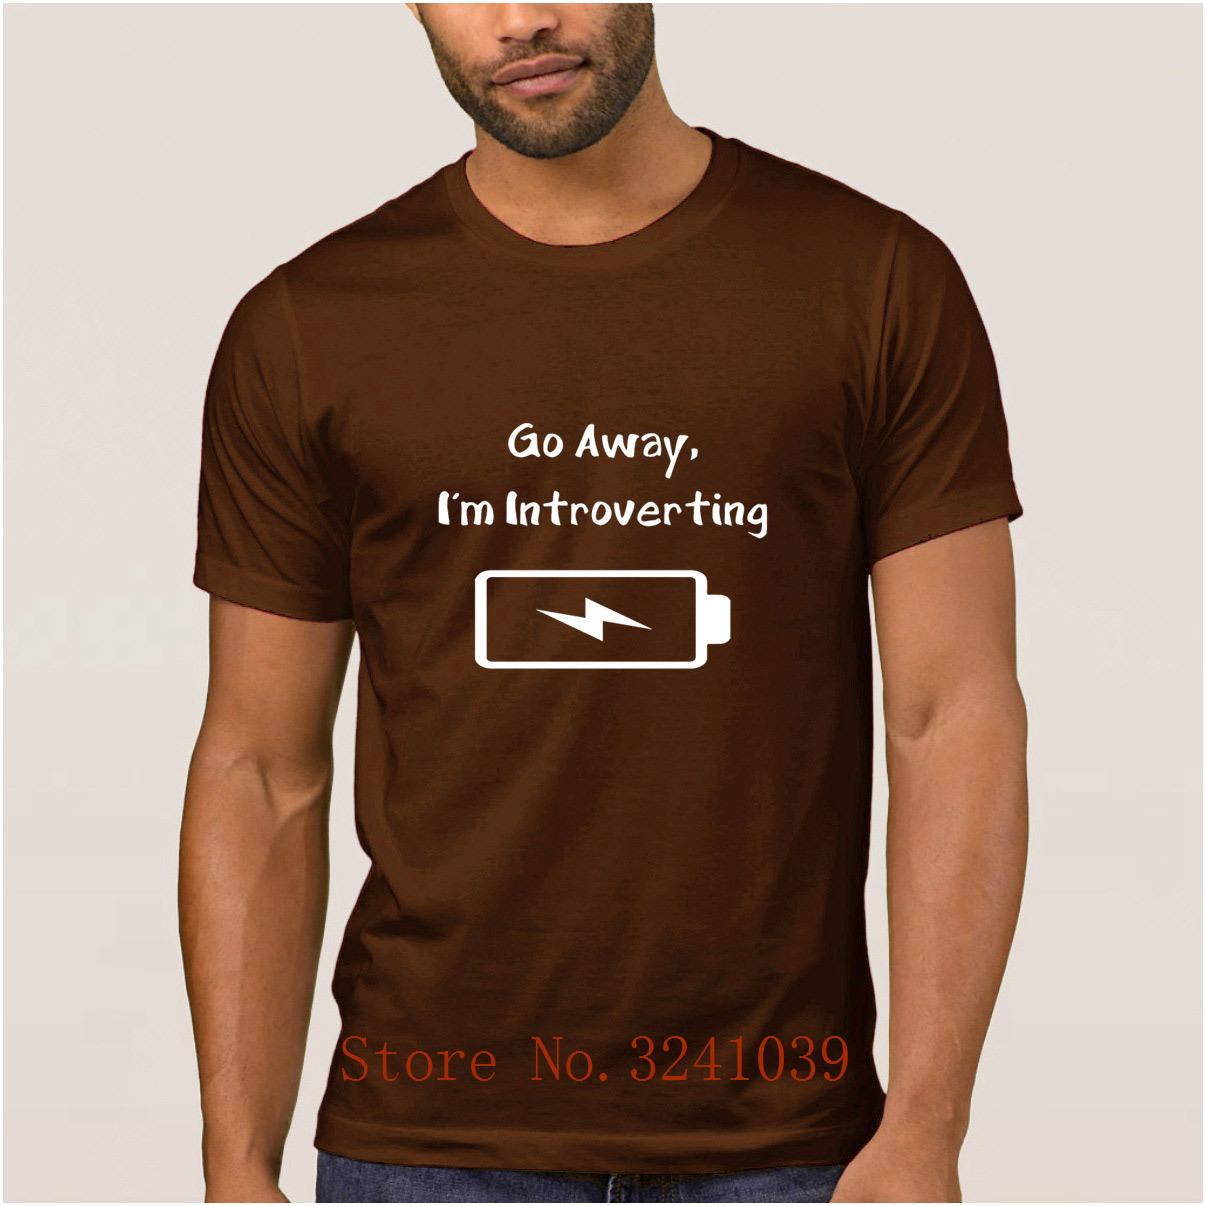 d350b7ae La Maxpa New Arrival go away I'm introverting anti social men's t shirt  2017 Graphic t-shirt for men Euro Size S-3xl tshirt